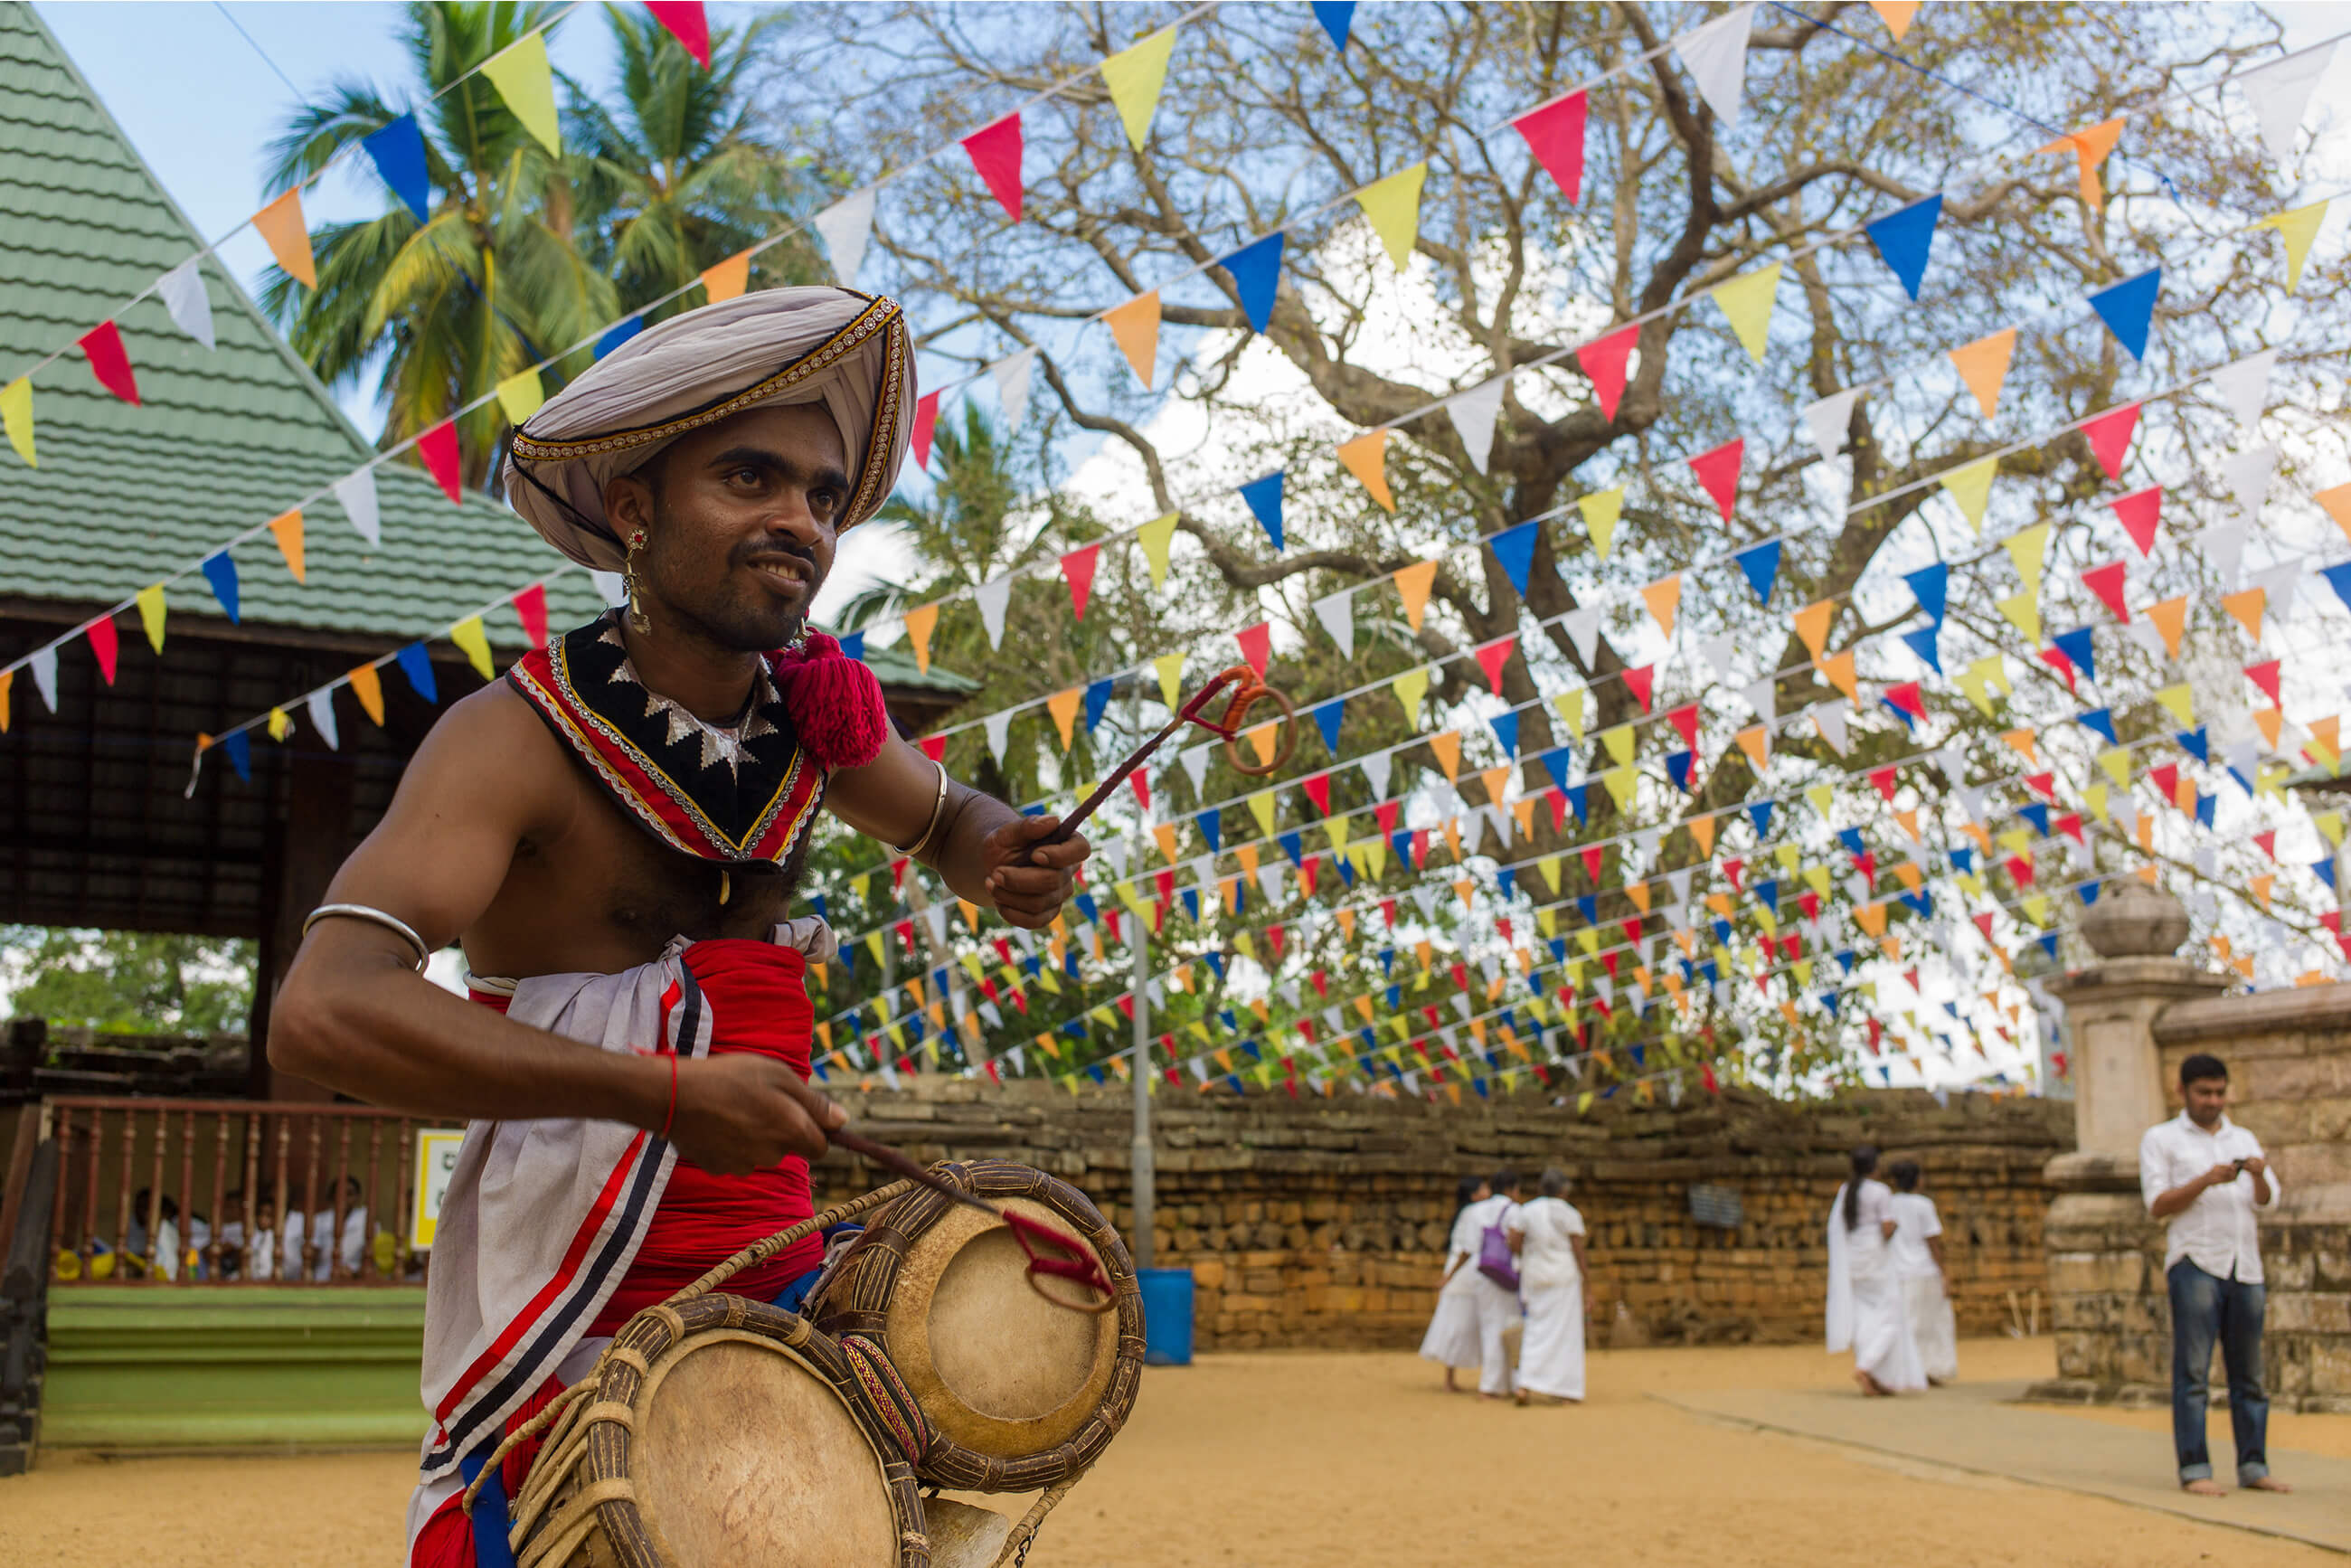 https://bubo.sk/uploads/galleries/7521/lubosfellner_srilanka-2-.jpg